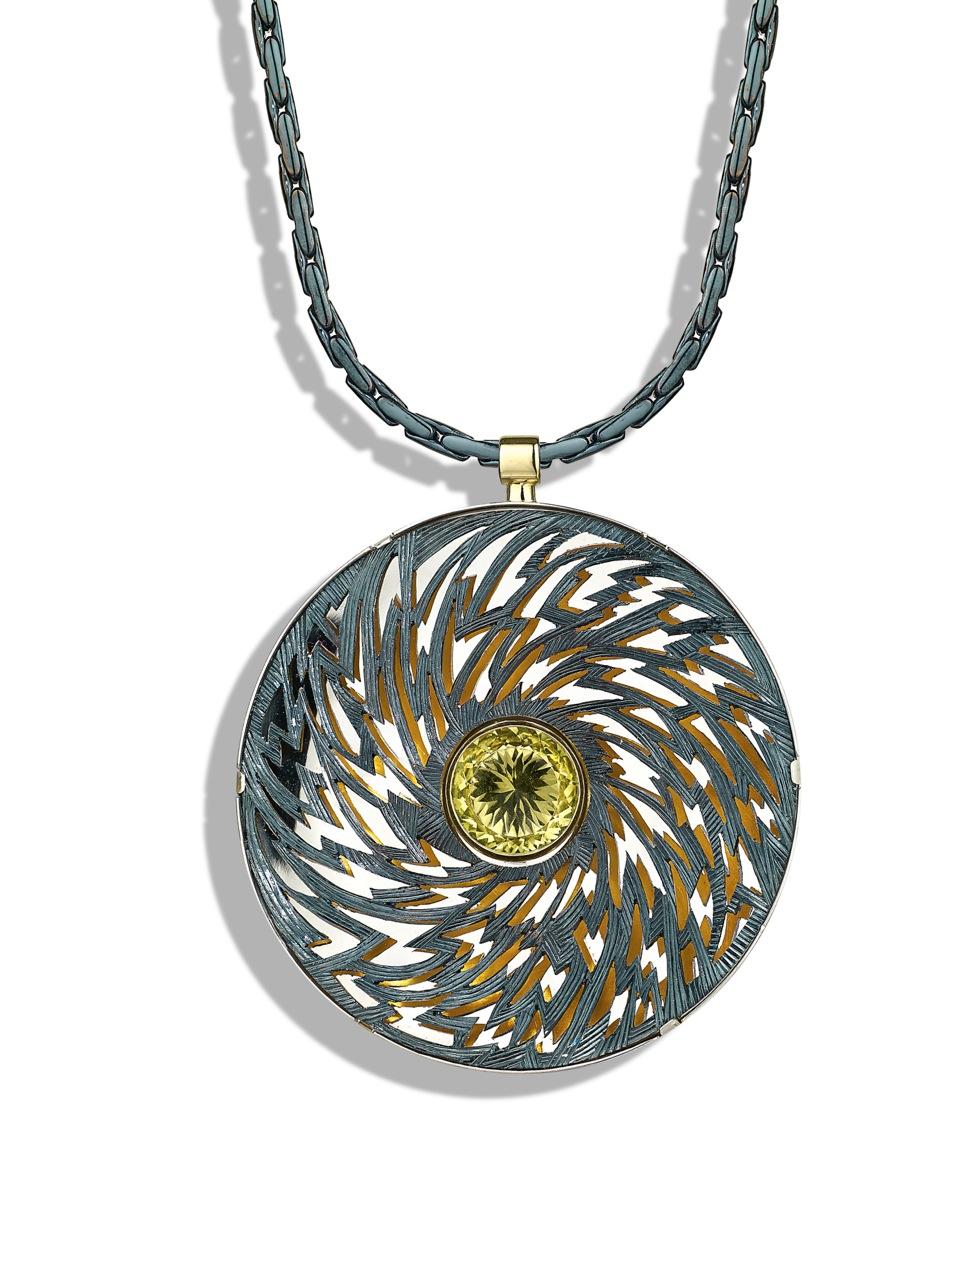 "<a href=""/node/265"">Black Lightening : Billcliffe Gallery cover photo. 6cm diameter. Silver piereced hand engraved. Finished in Bliue / Black Rhodium. Centre stone Lemon Quartz.  View 2 white background.</a>"